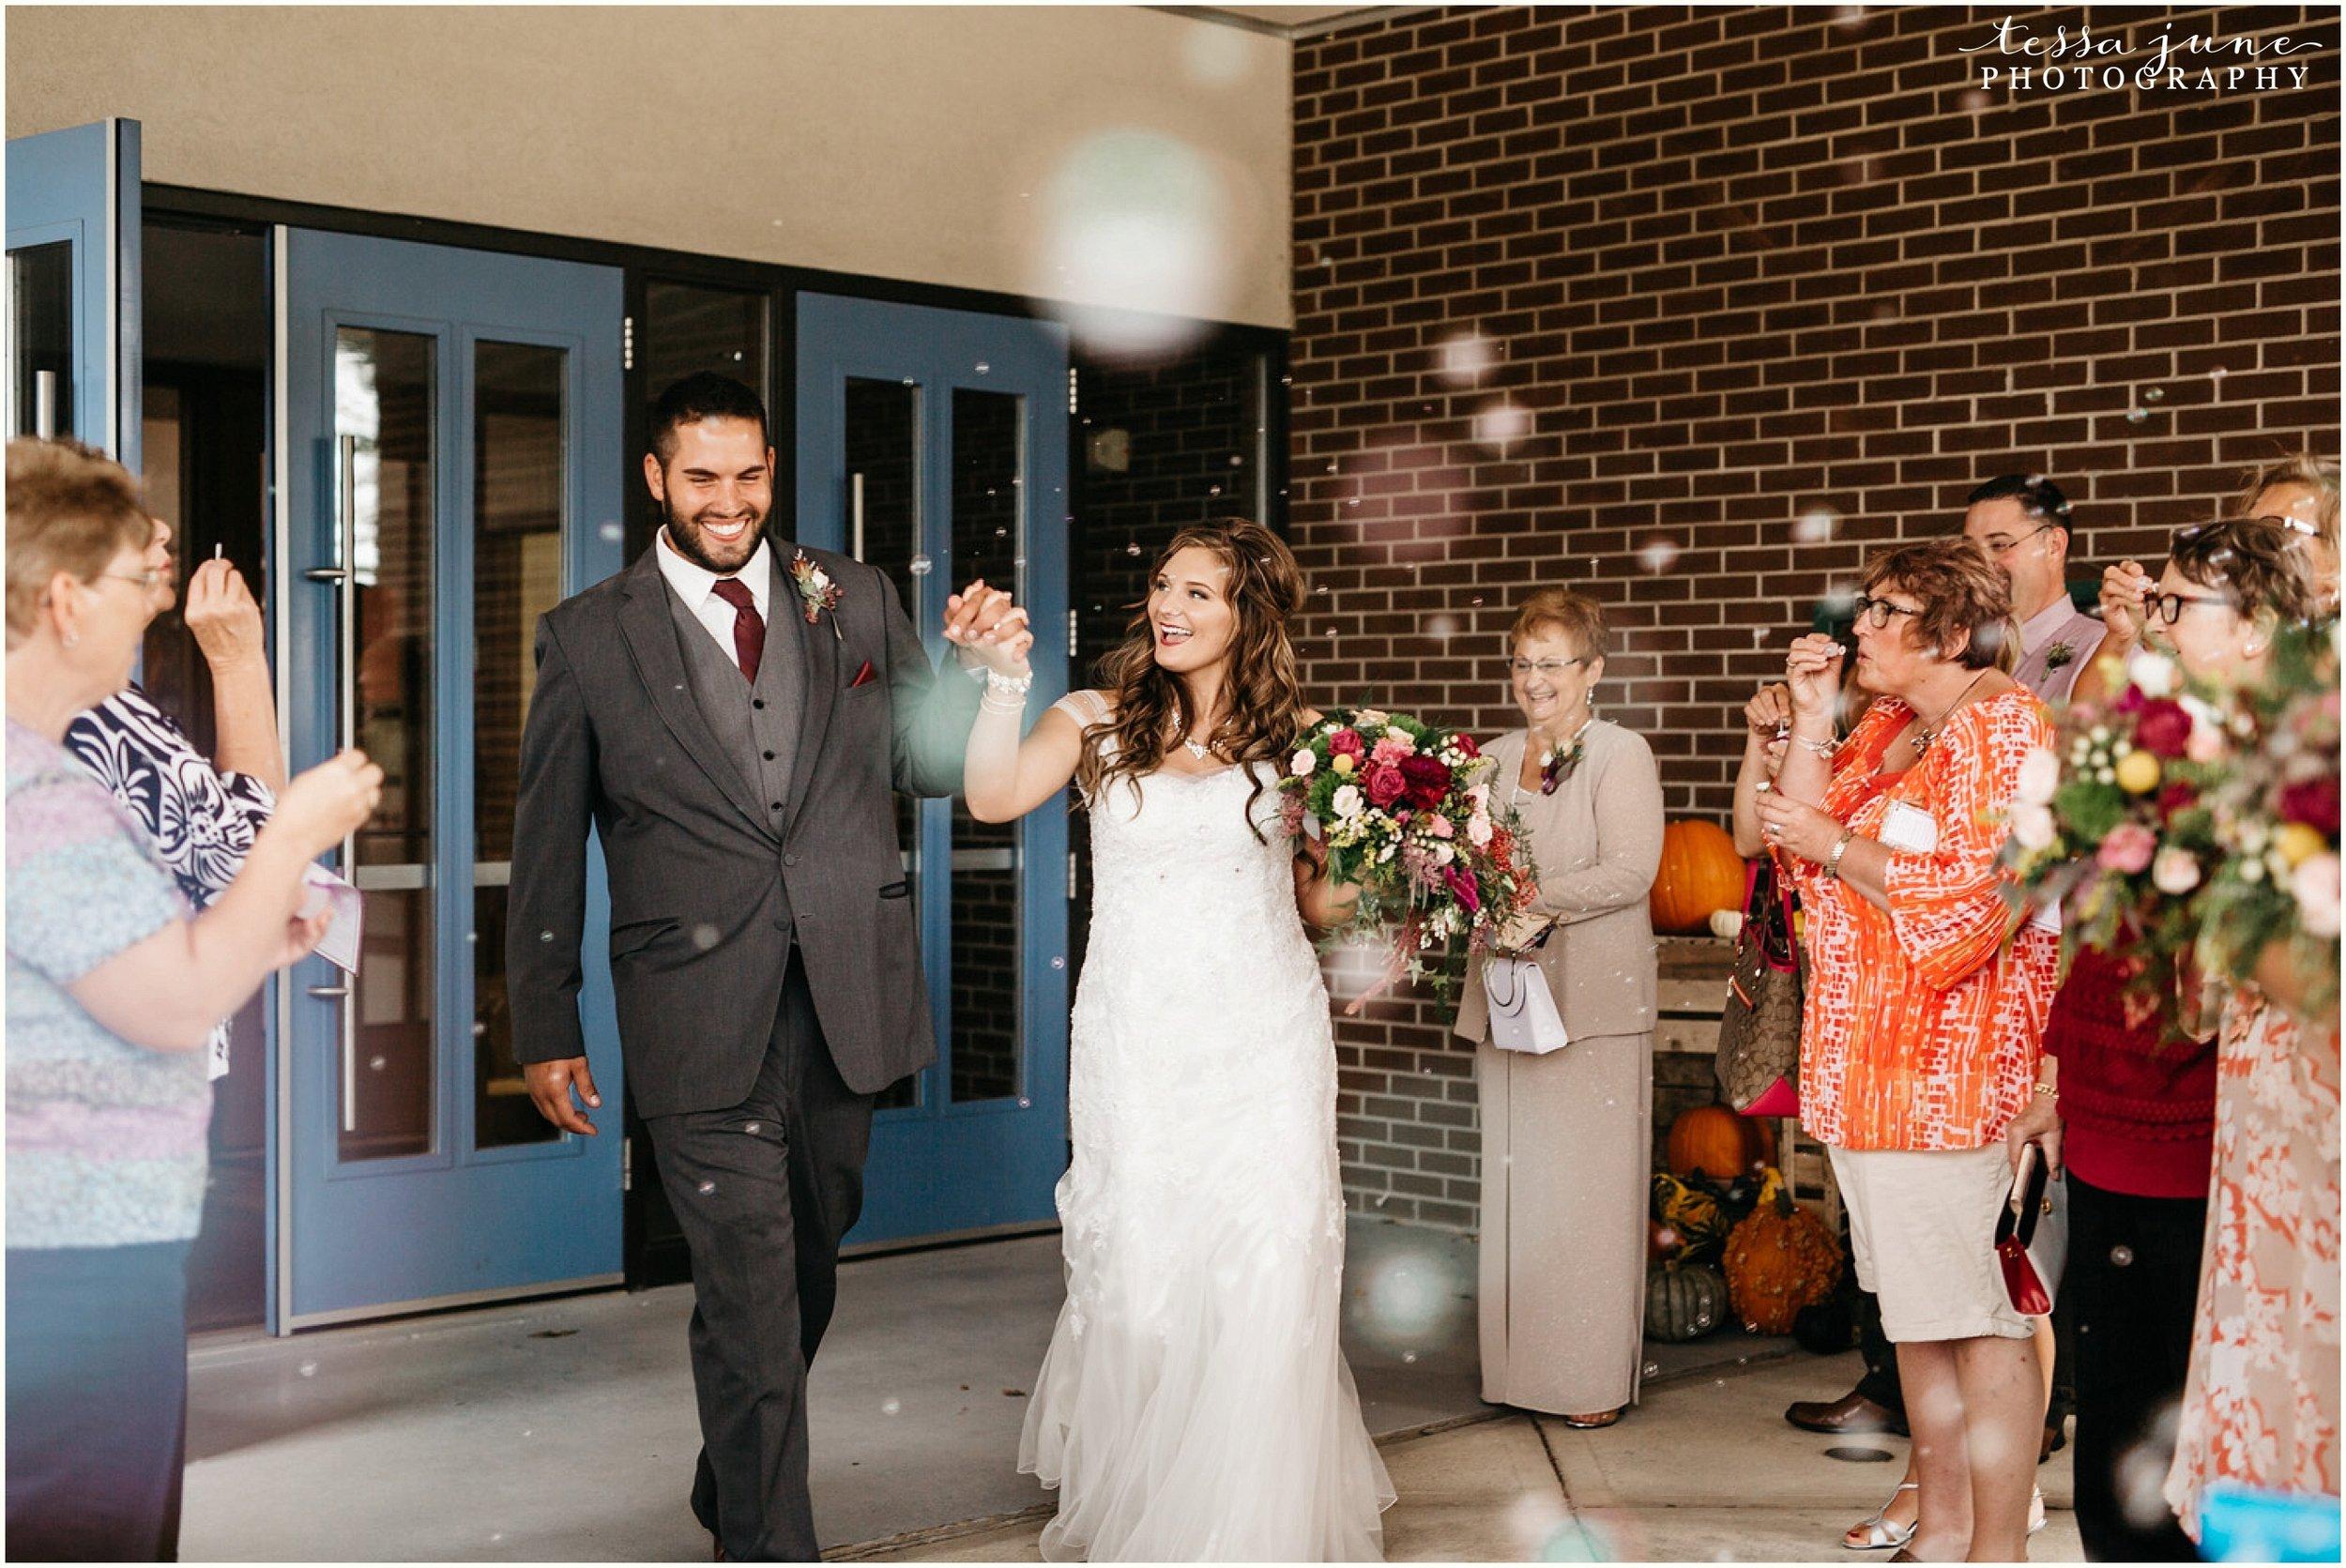 bohemian-minnesota-wedding-mismatched-bridesmaid-dresses-waterfall-st-cloud-tessa-june-photography-121.jpg